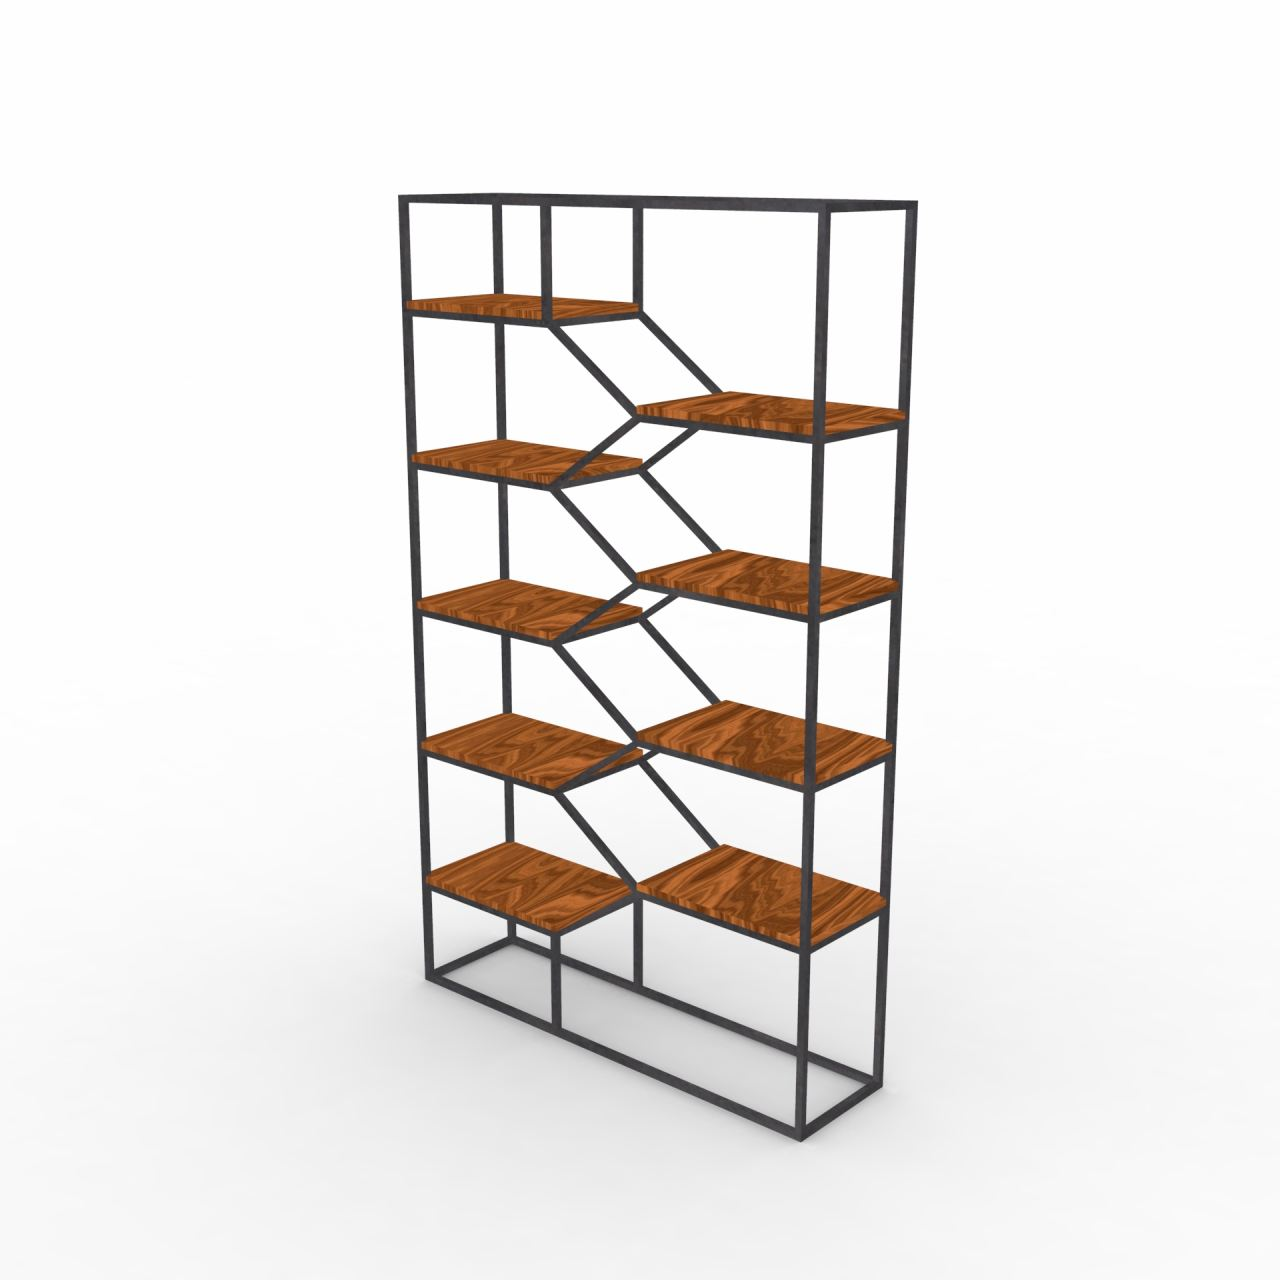 کتابخانه مدل کلیف